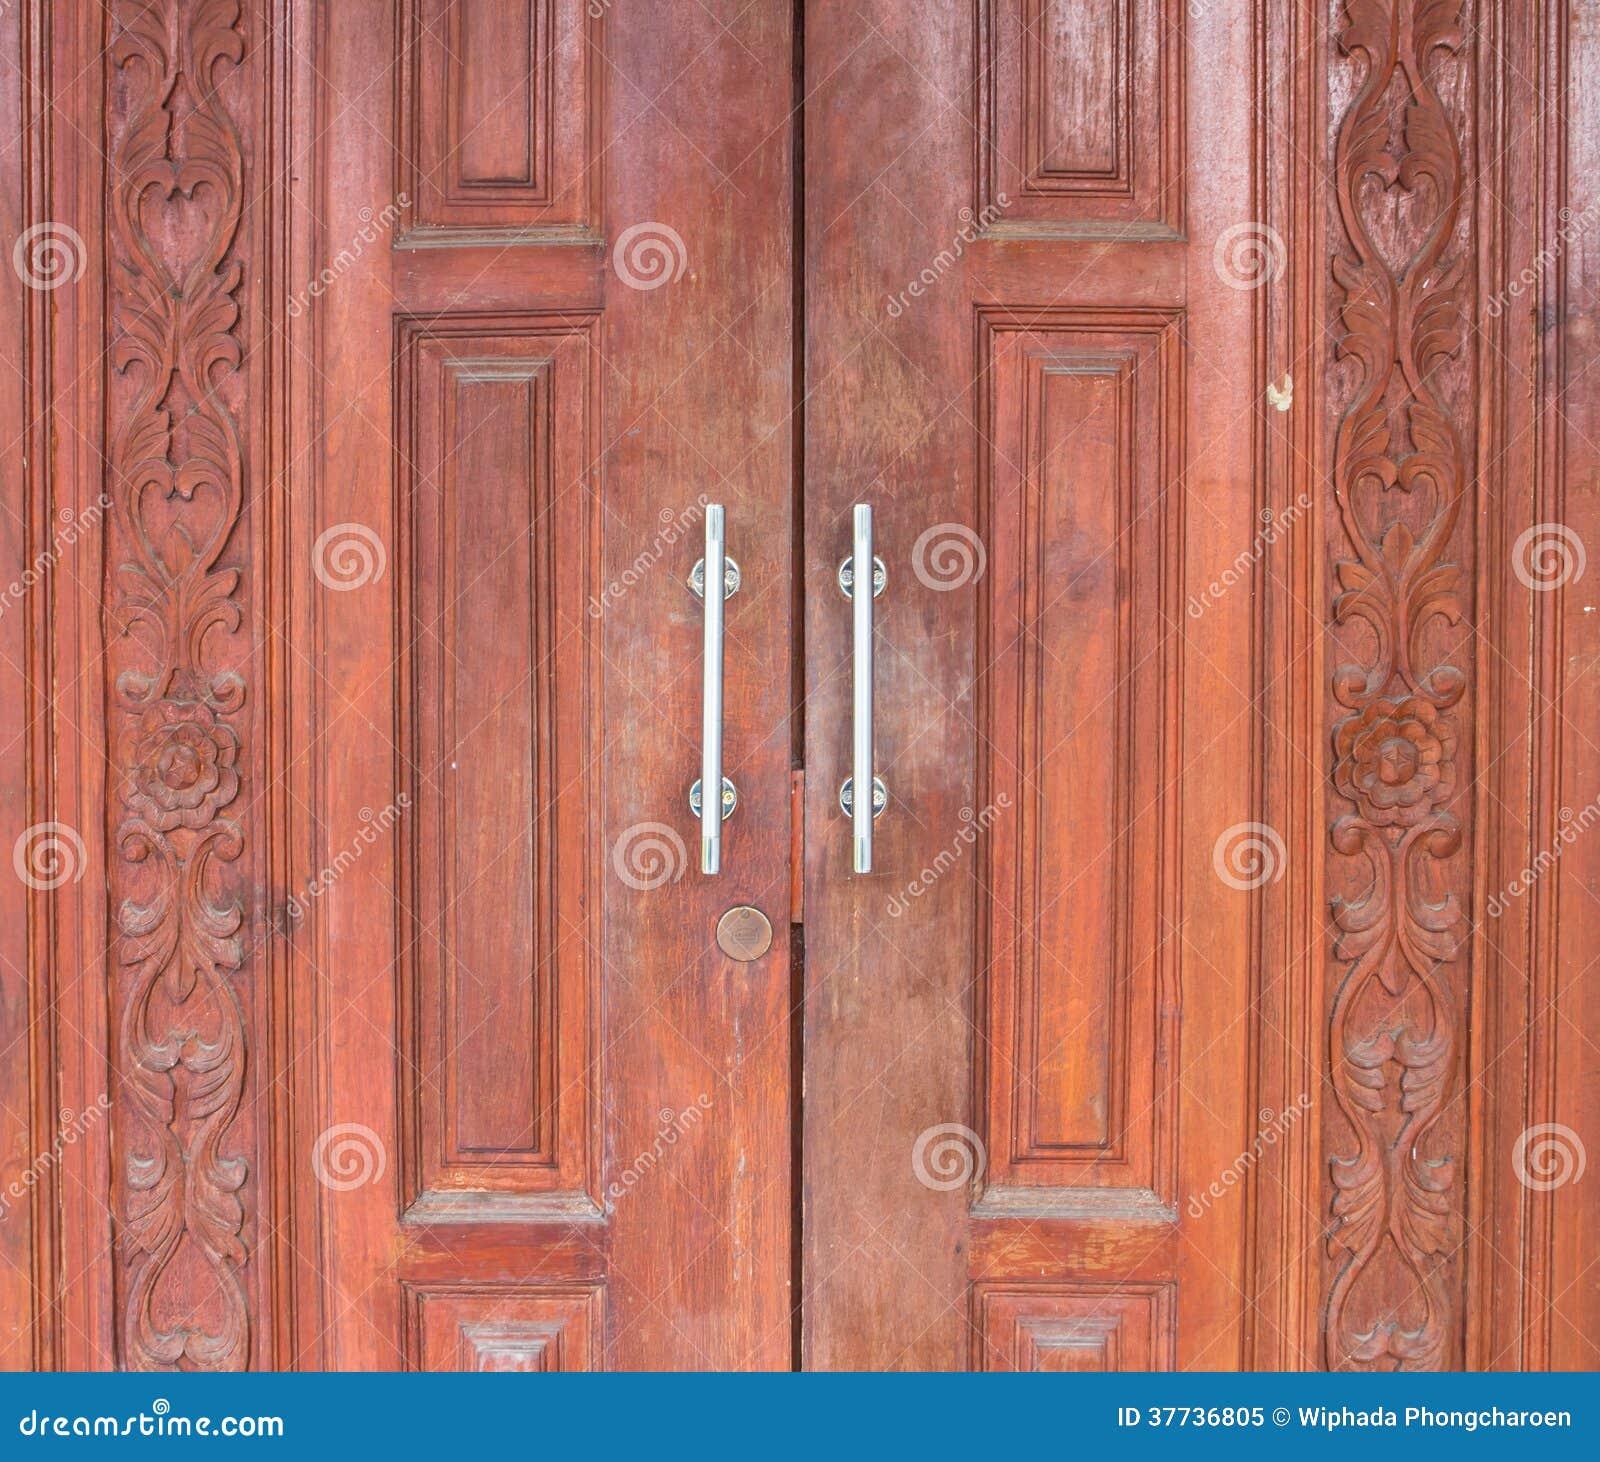 Carved Wooden Door Thai Design Craft Stock Image Image Of